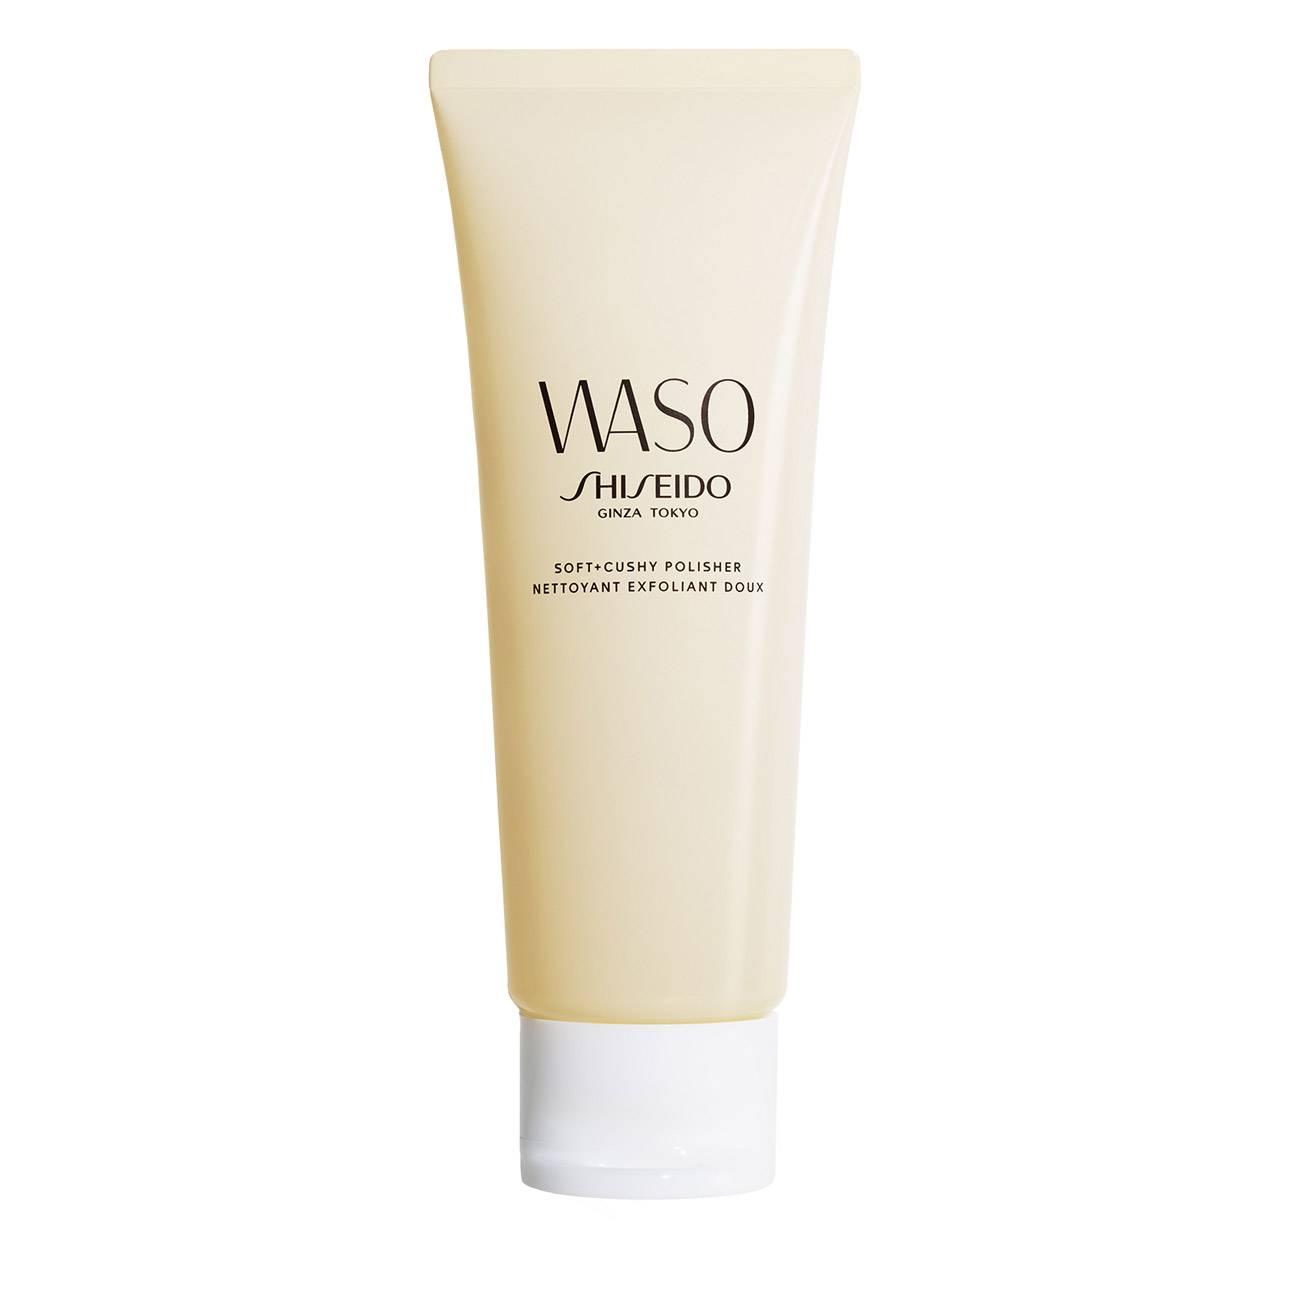 Waso Soft And Cushy Polisher 75 Ml Shiseido imagine 2021 bestvalue.eu